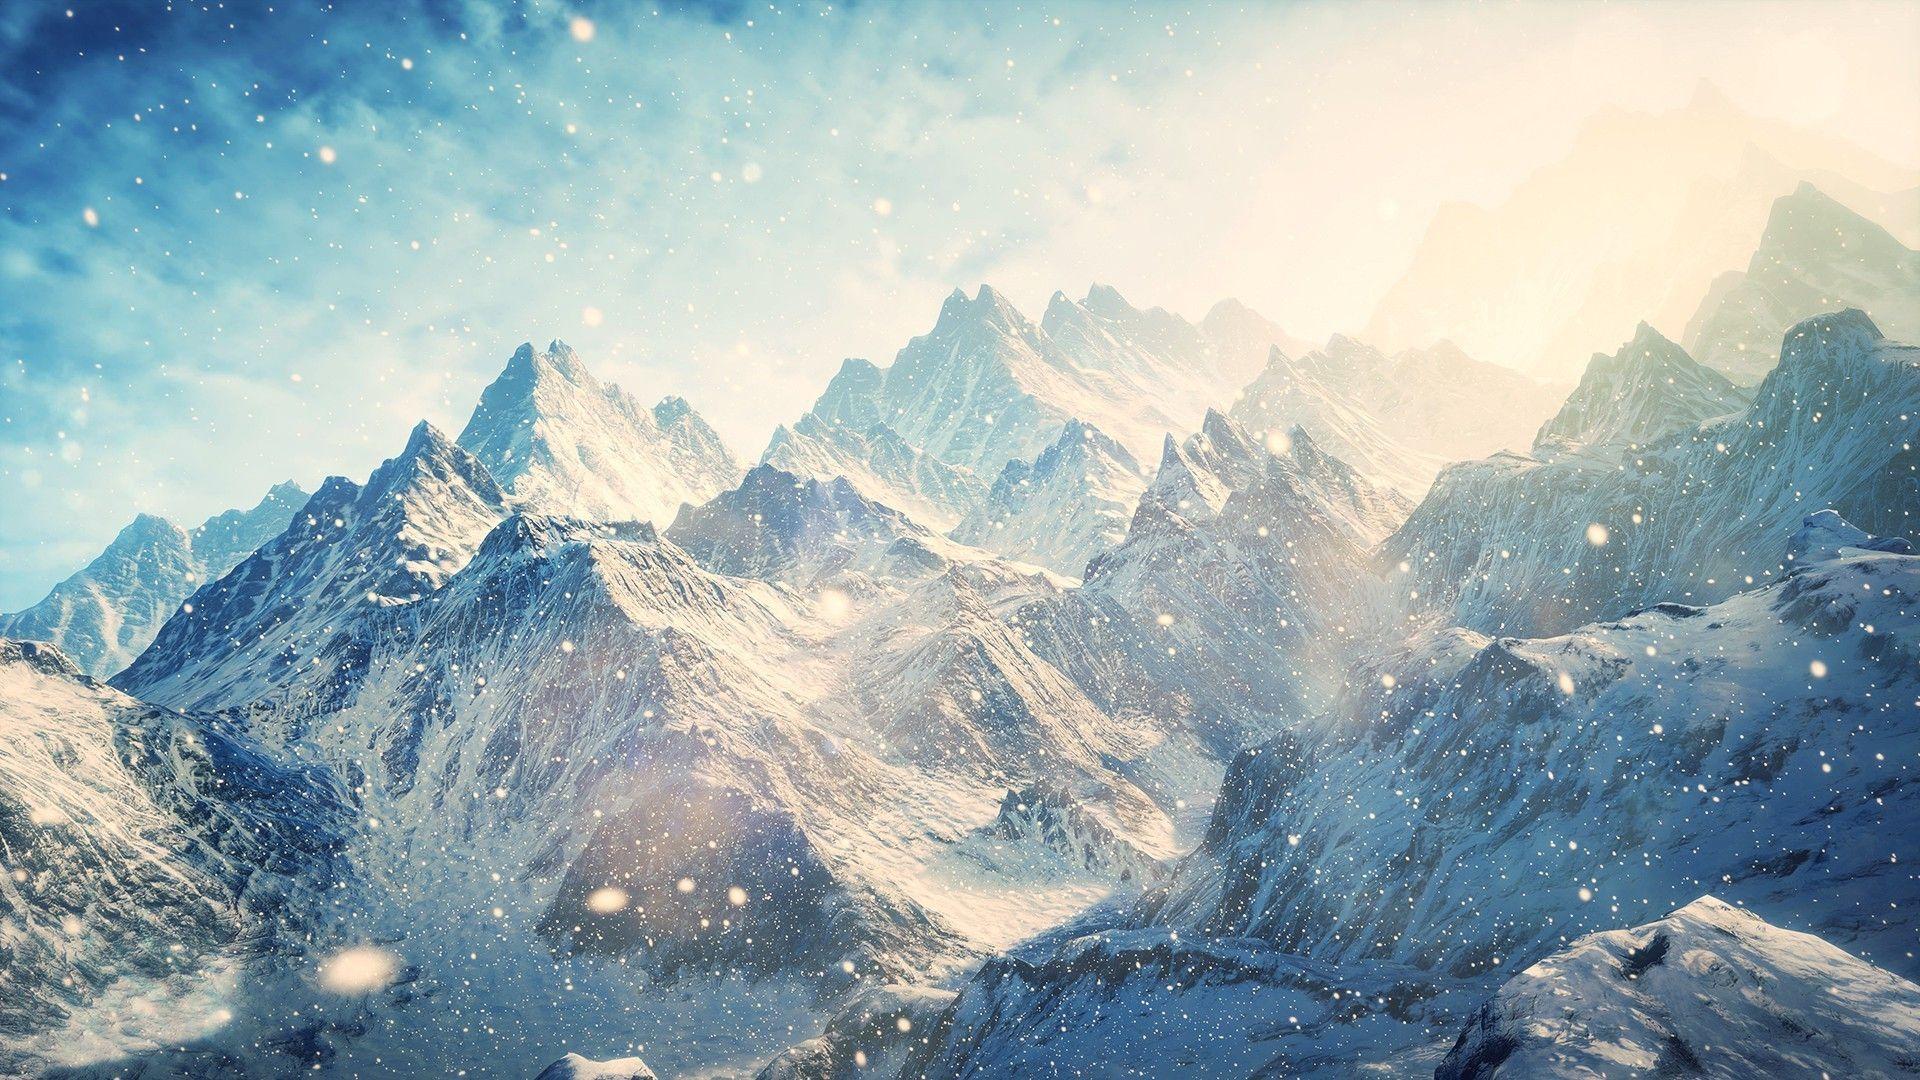 Mountain Wallpaper 4k